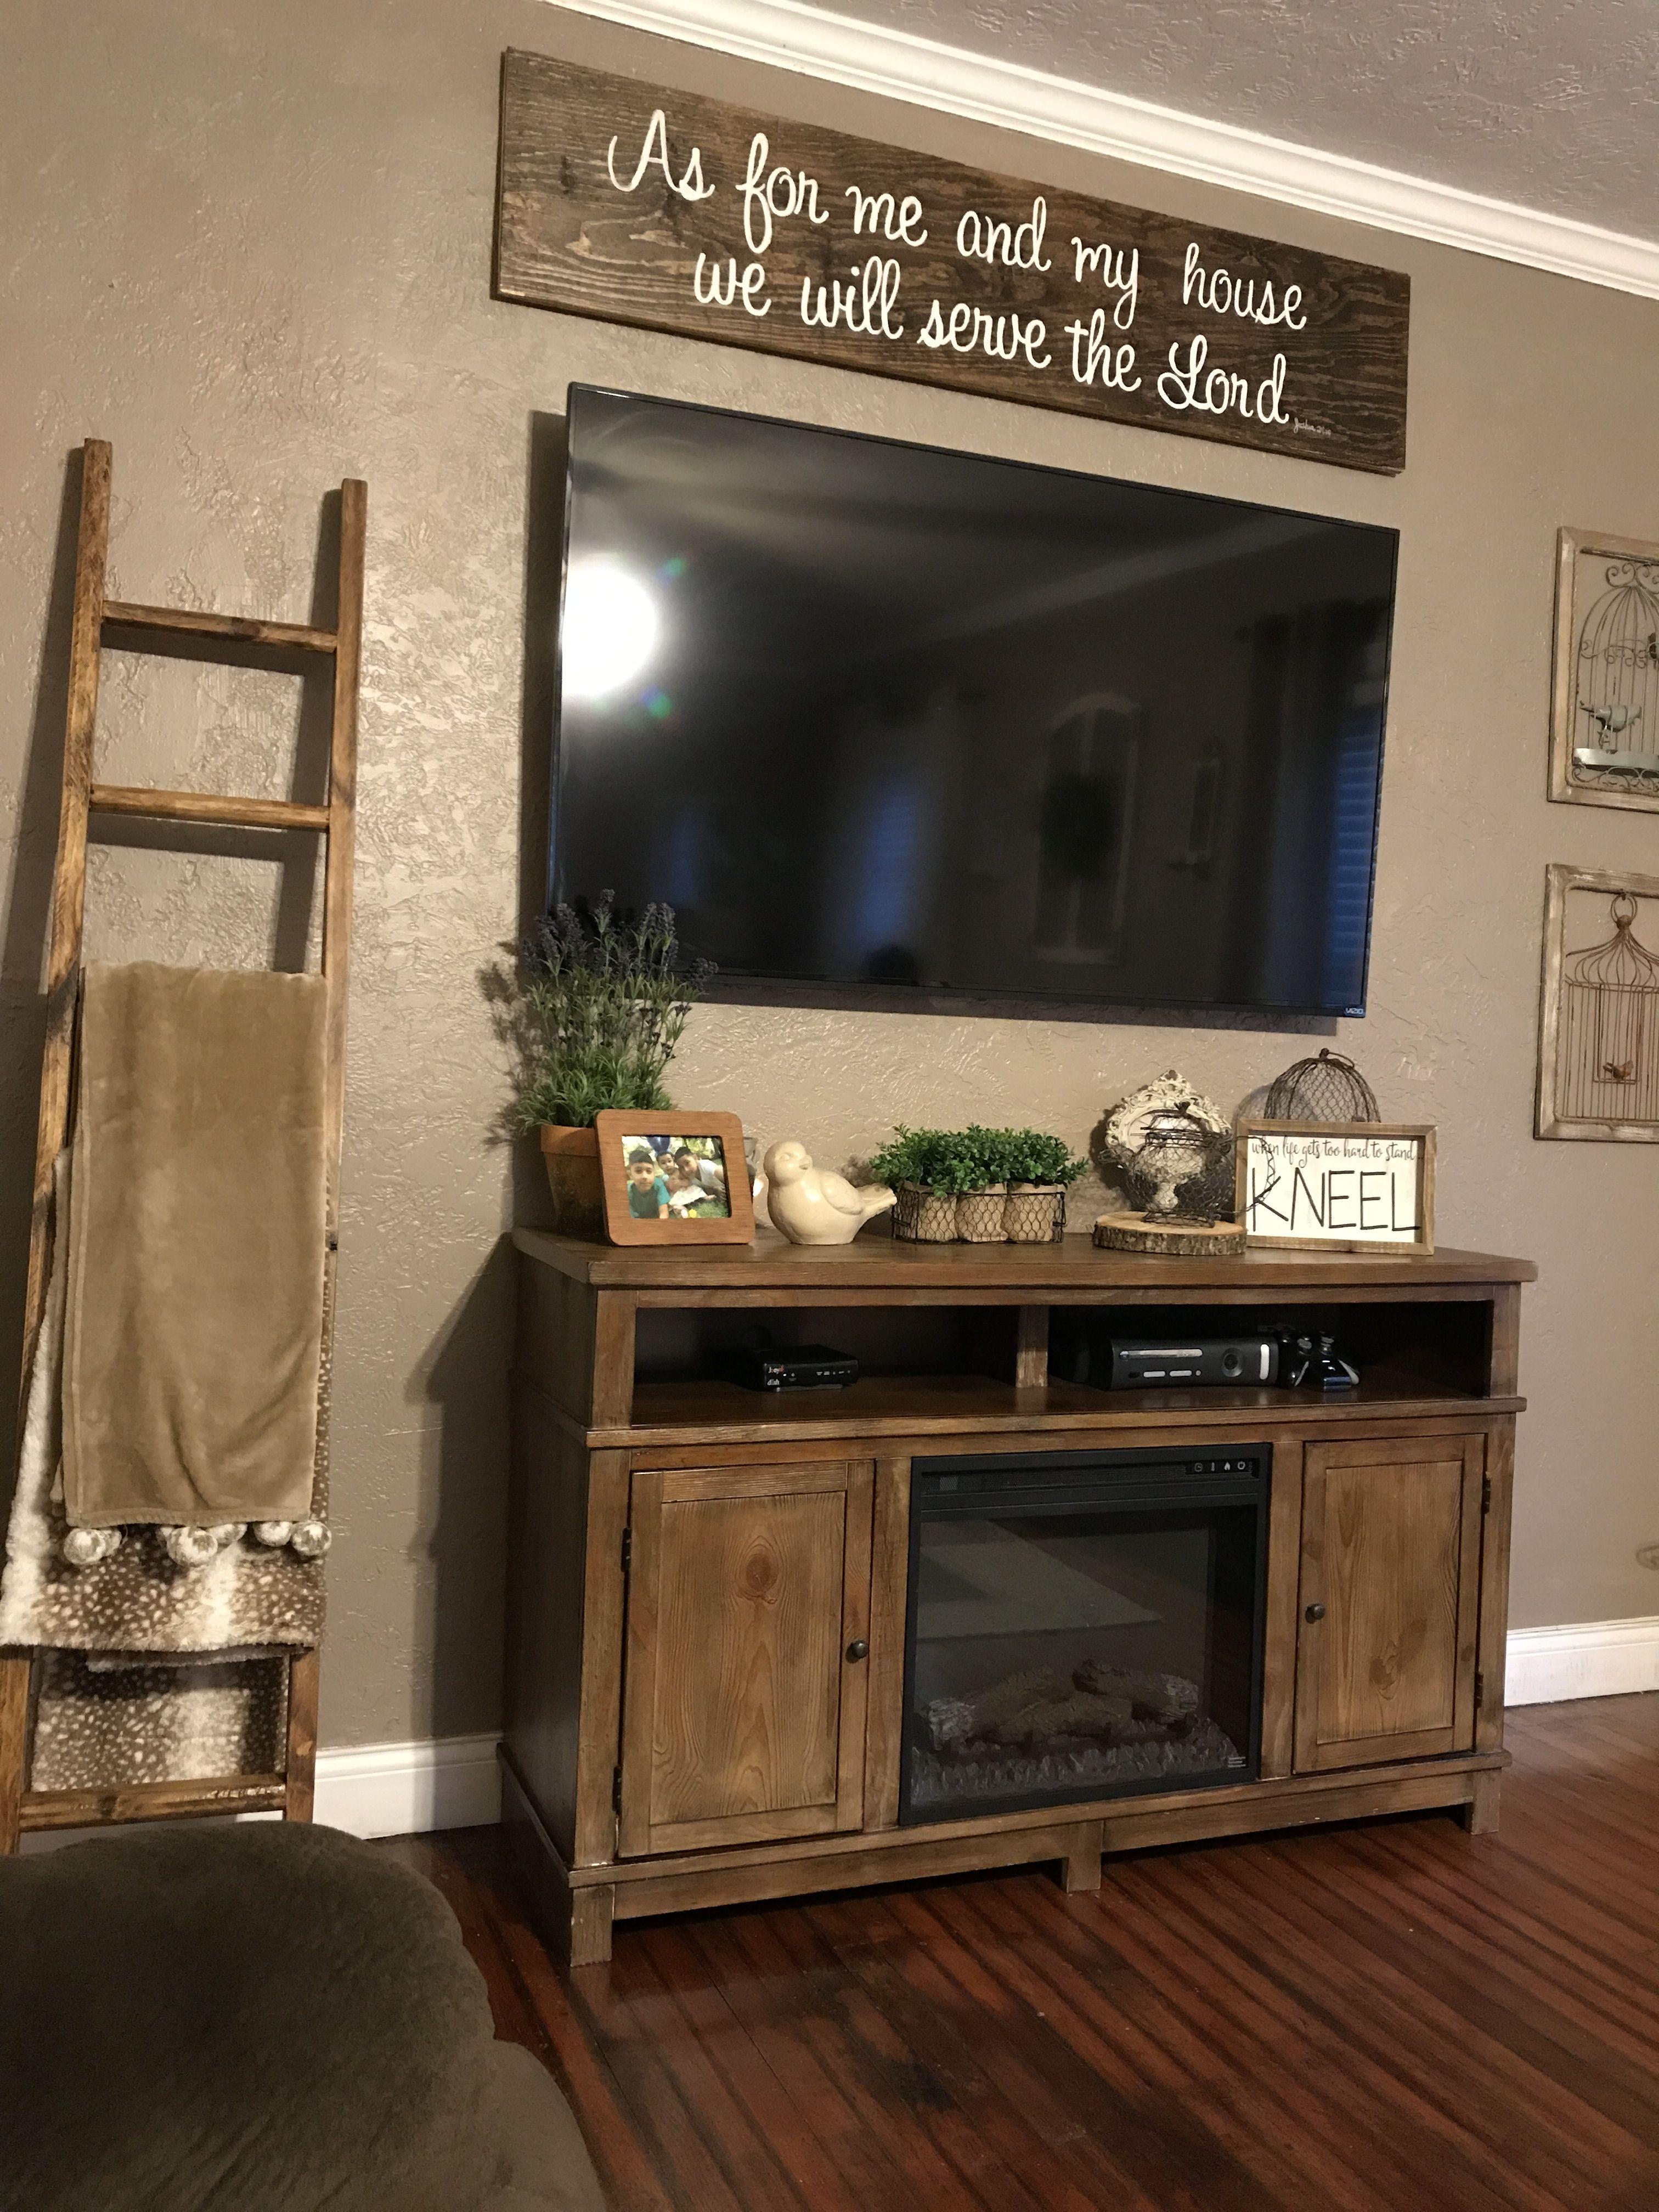 Diy Sign Living Room Remodel Tv Decor Farm House Living Room